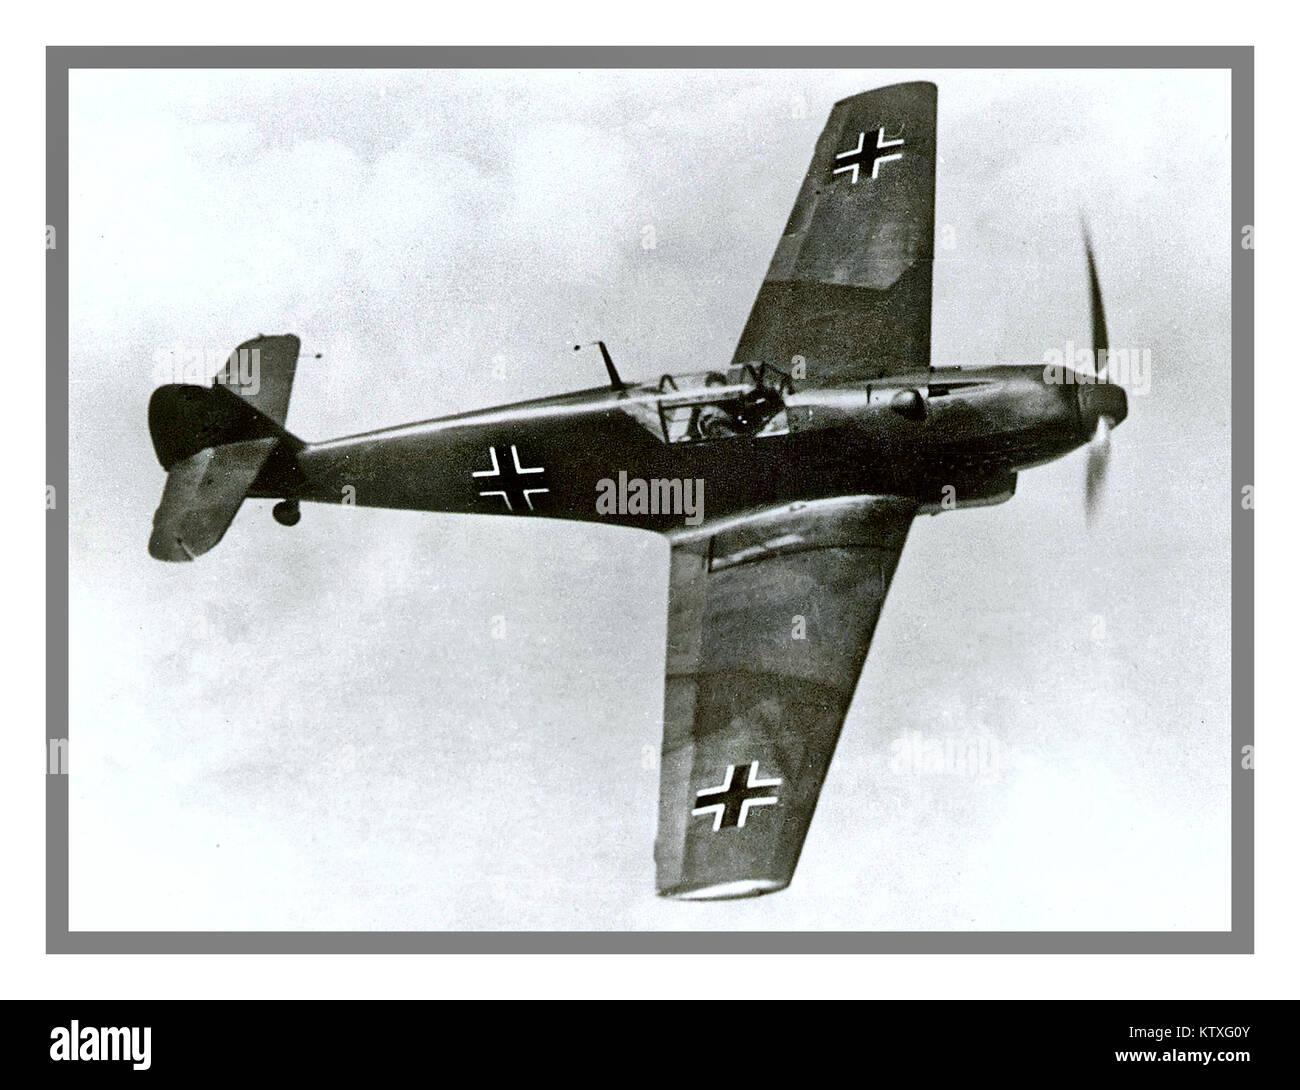 WW2 Messerschmitt-Bf-109 Fighter aircraft used by Nazi Germany Luftwaffe during World War 11 1940's legendary - Stock Image